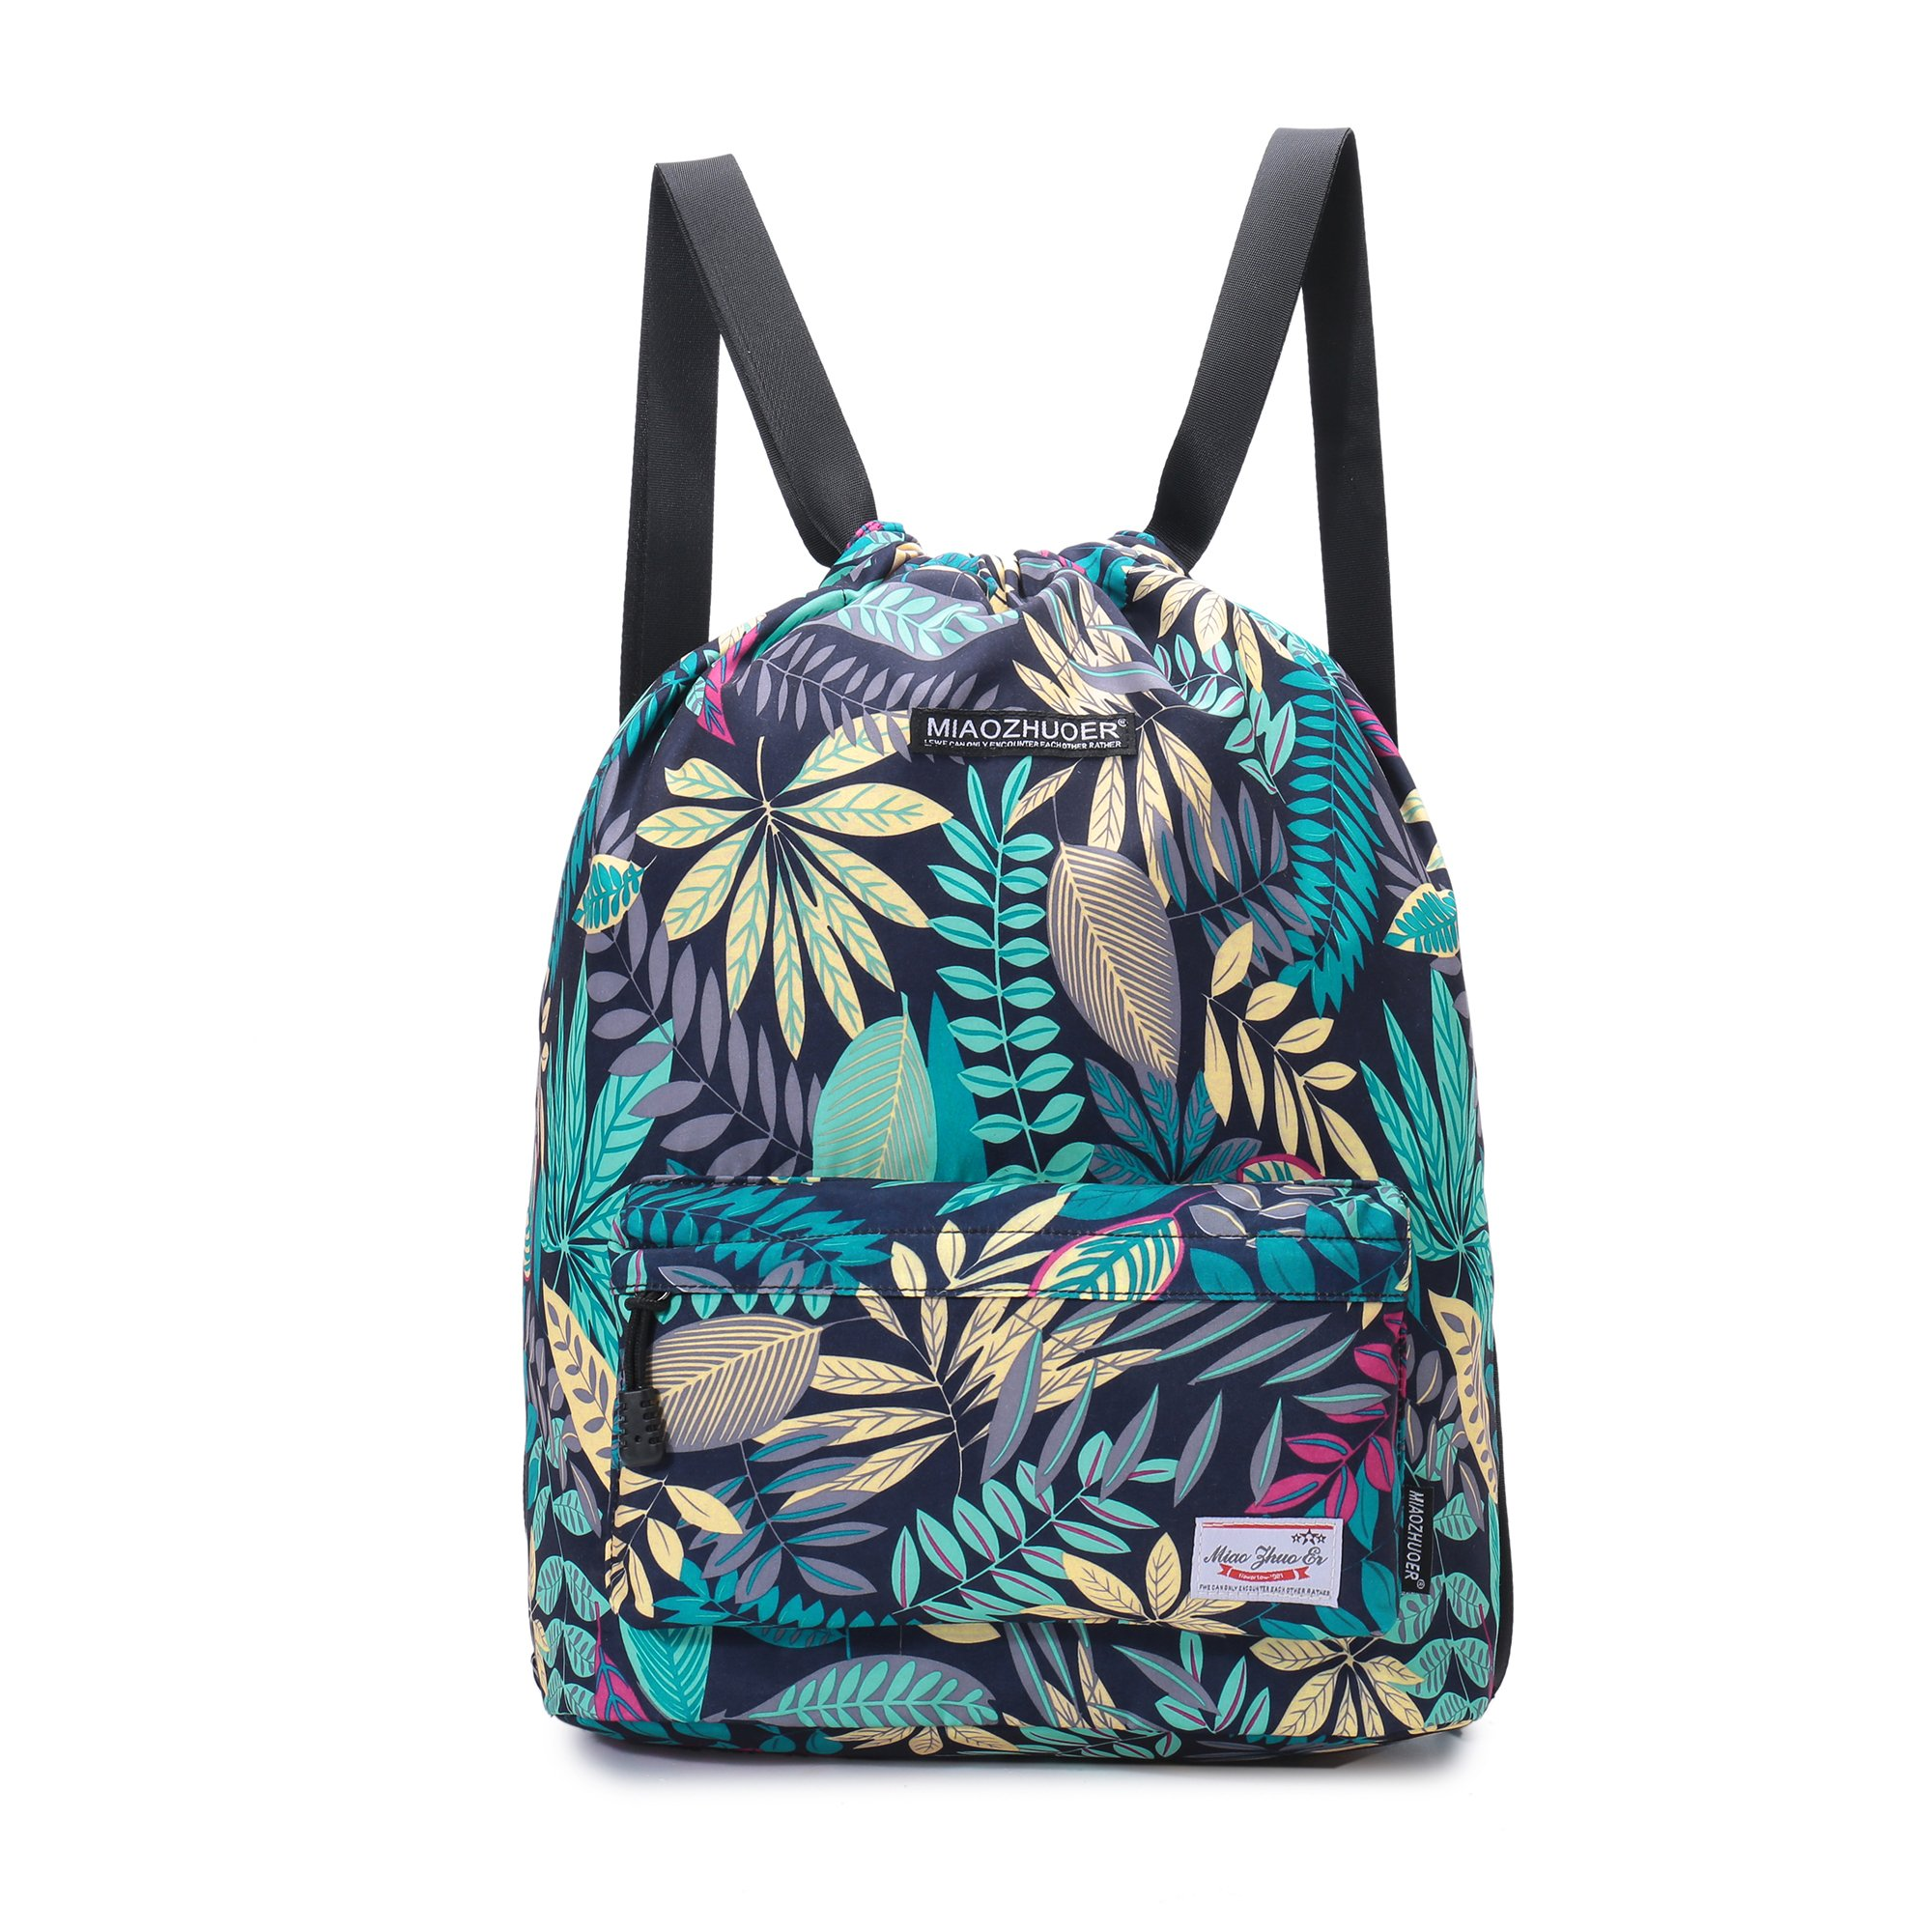 Yinjue Sport GymSack Cinch Sack Drawstring Backpack For Men&Women Kids, Lightweight Foldable Travel Hiking Yoga Summer Swimming Dancer Bags (Yellow44)